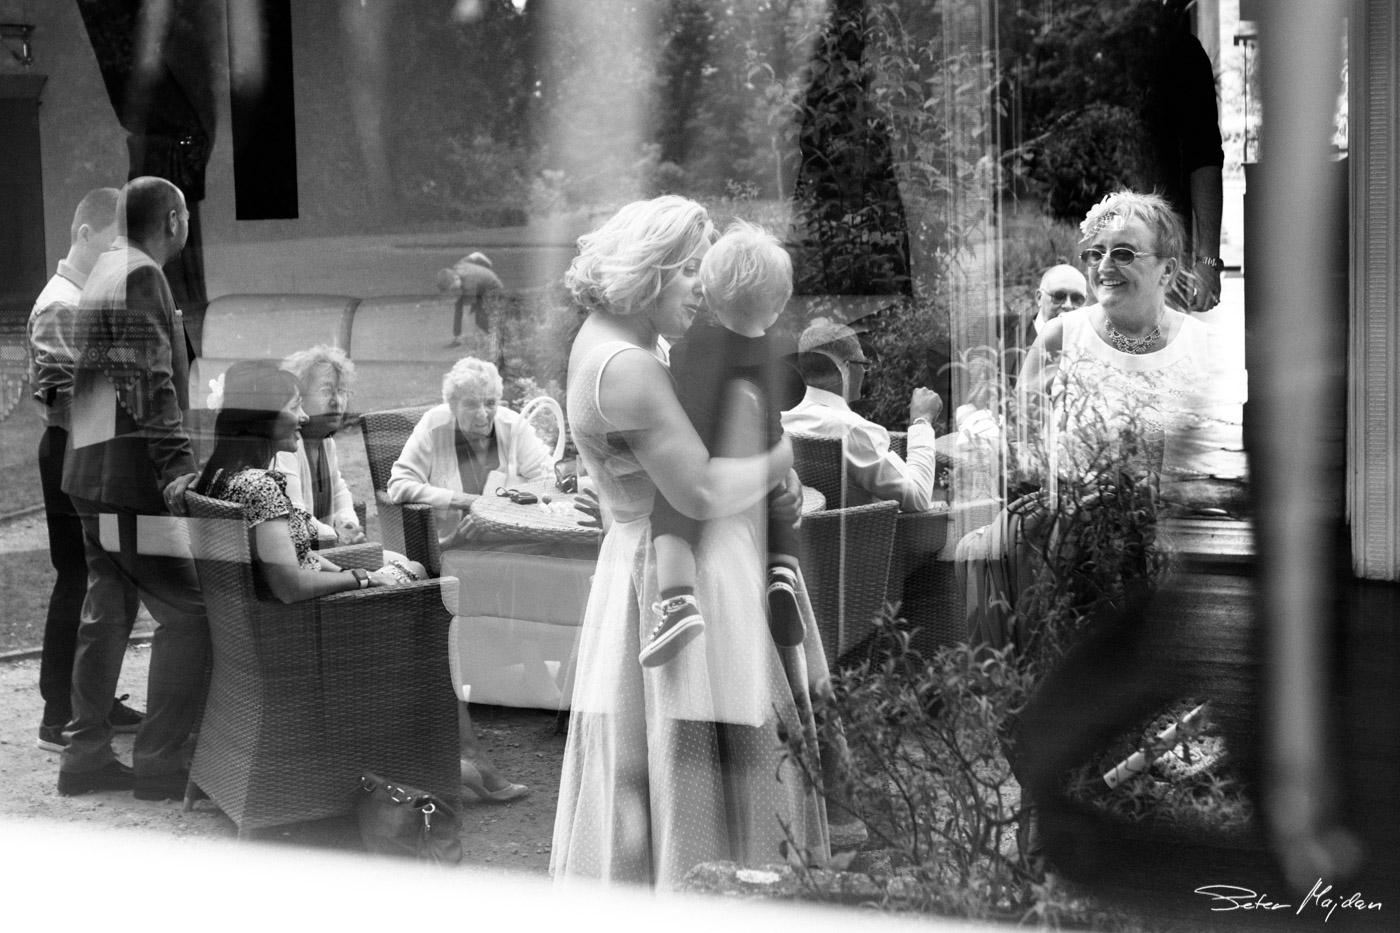 Colwick-hall-wedding-photography-45.jpg